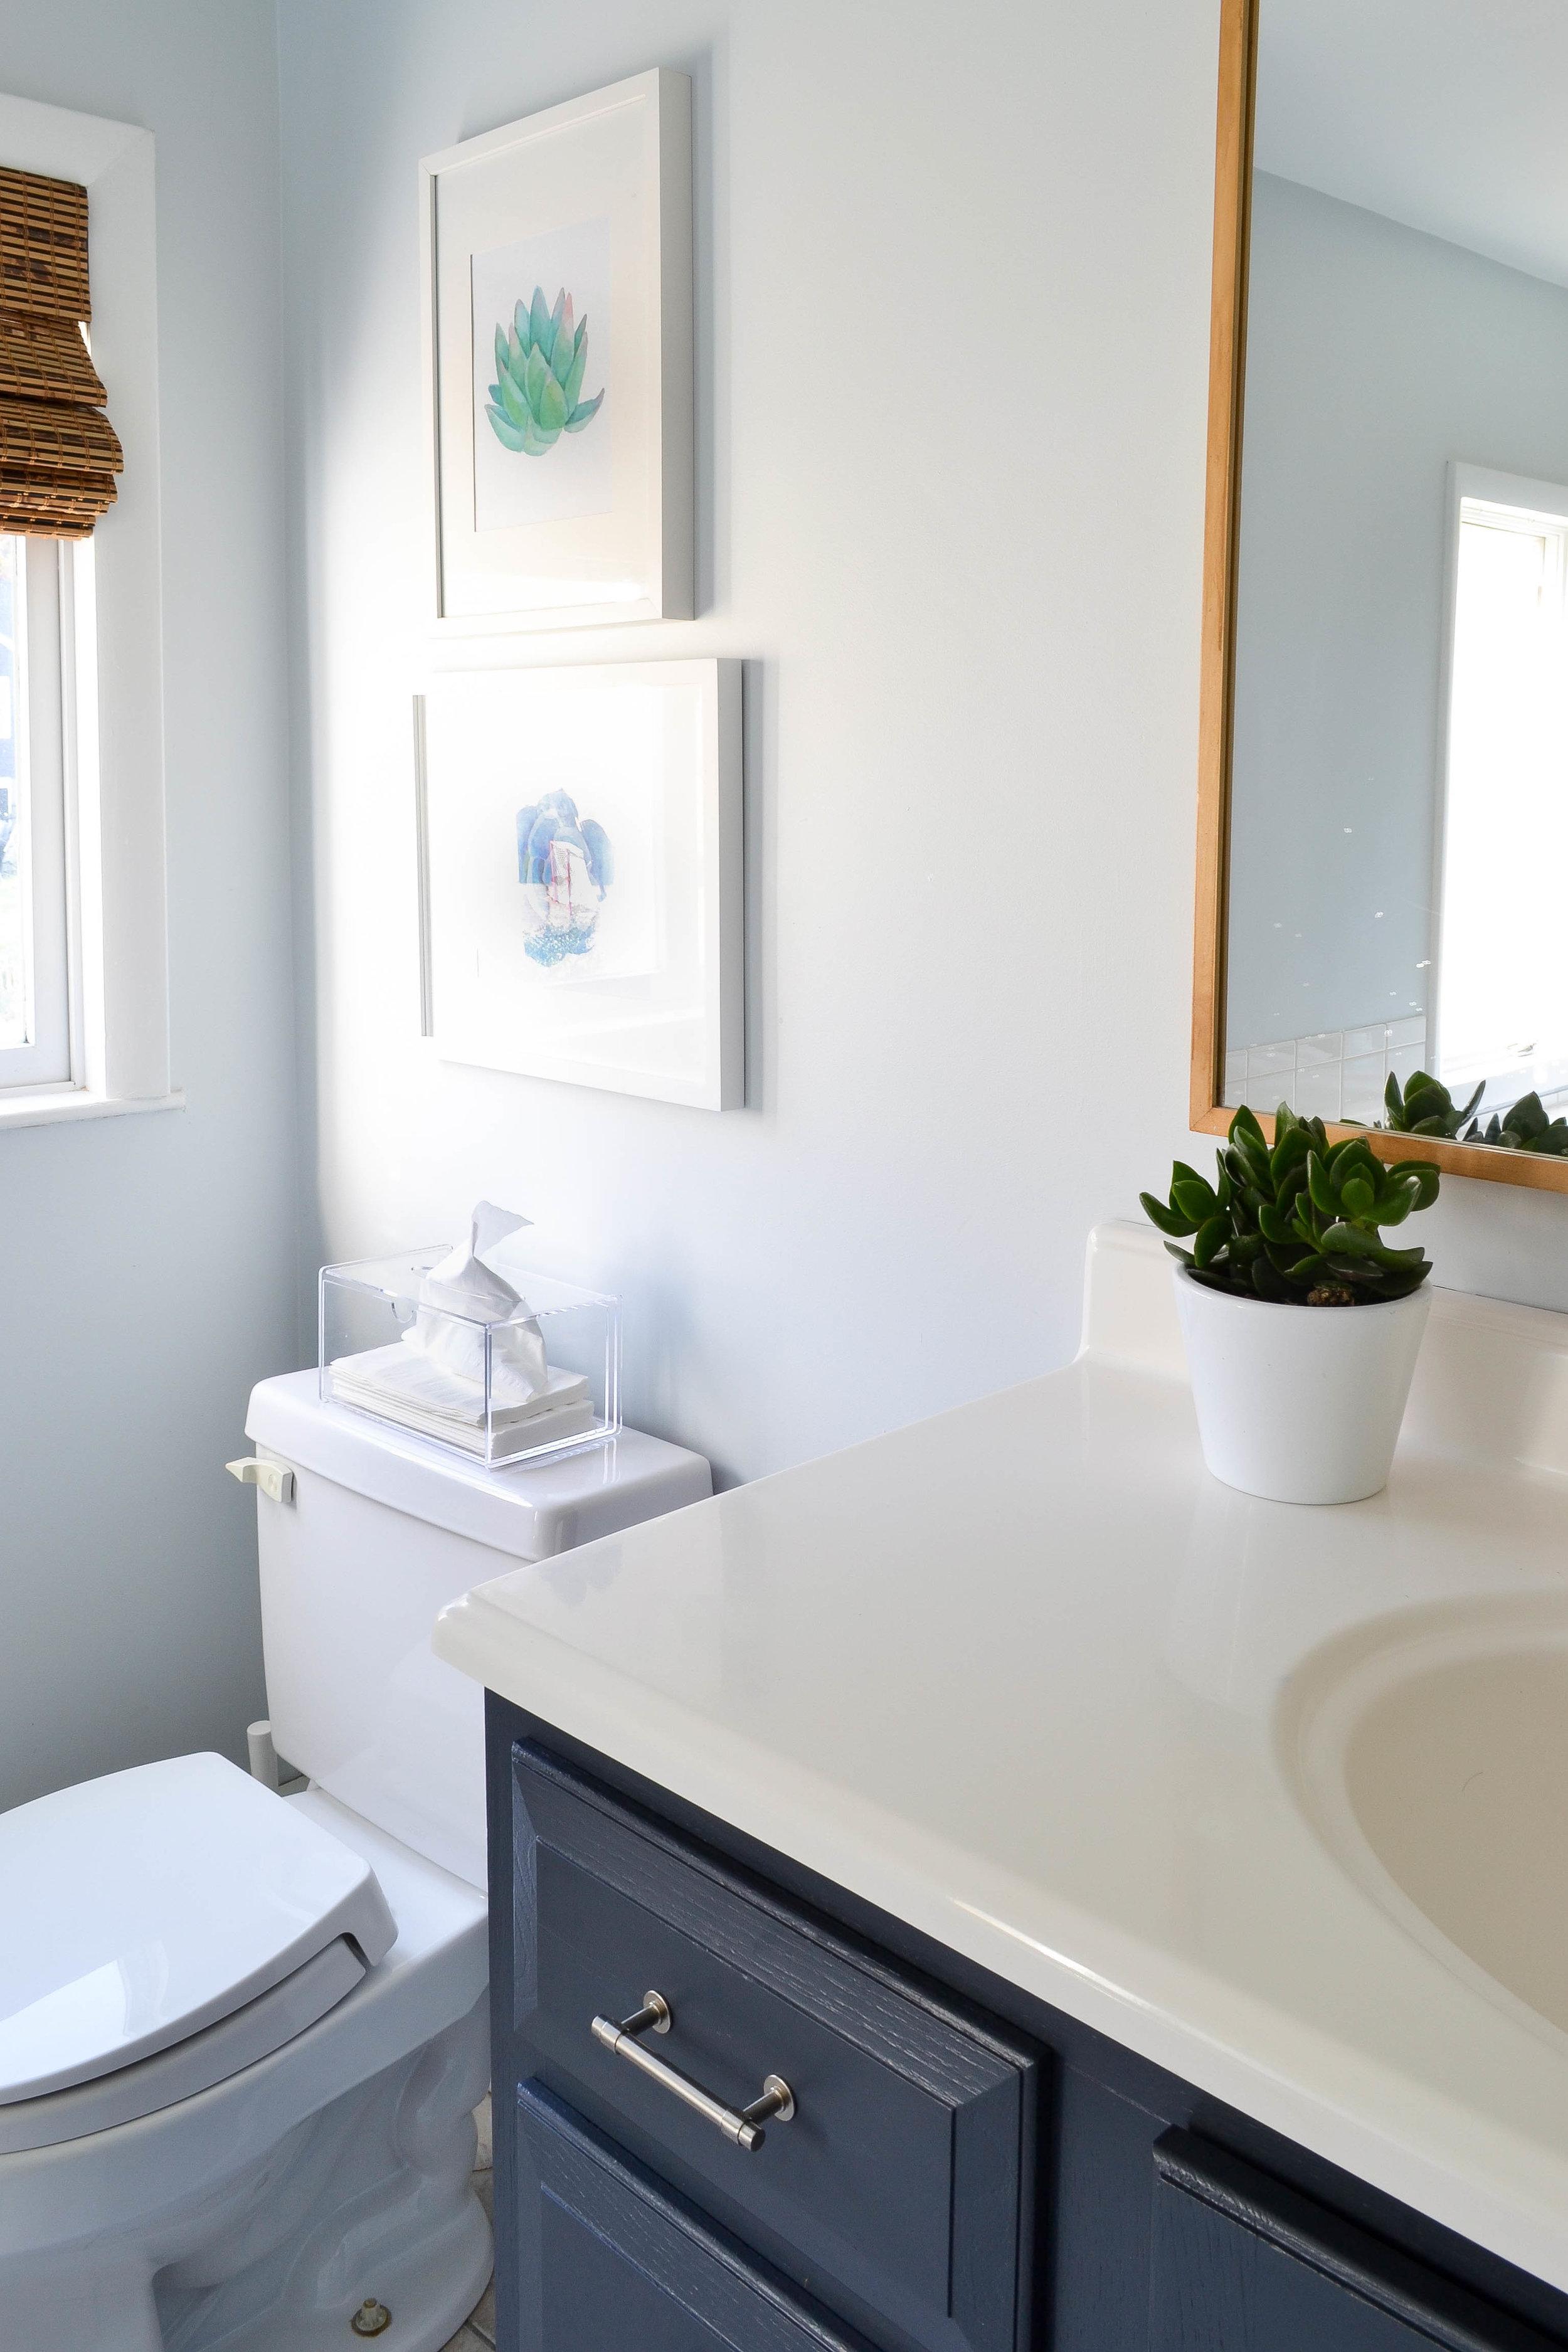 Gray Oak Studio - 2 Days 200 Dollars - Free bathroom art.